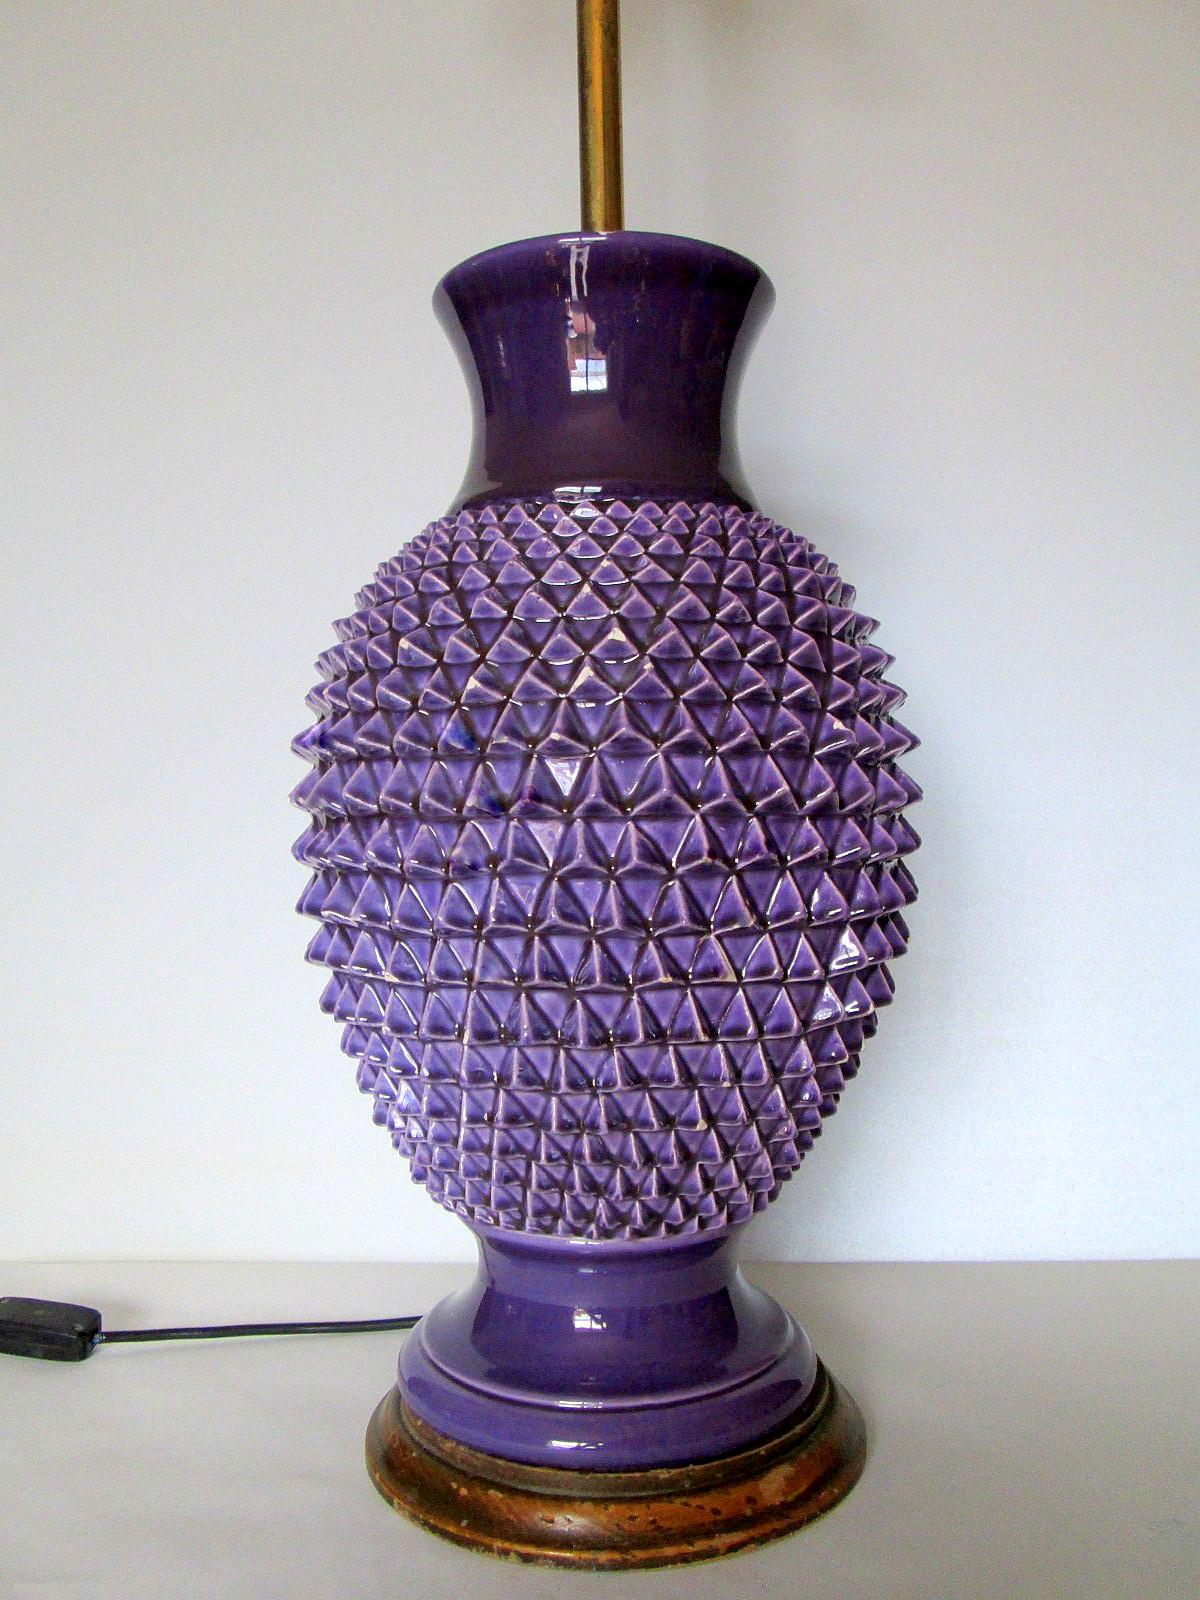 Vintage kitsch siglo xx lampara de cer mica de manises for Lamparas de ceramica